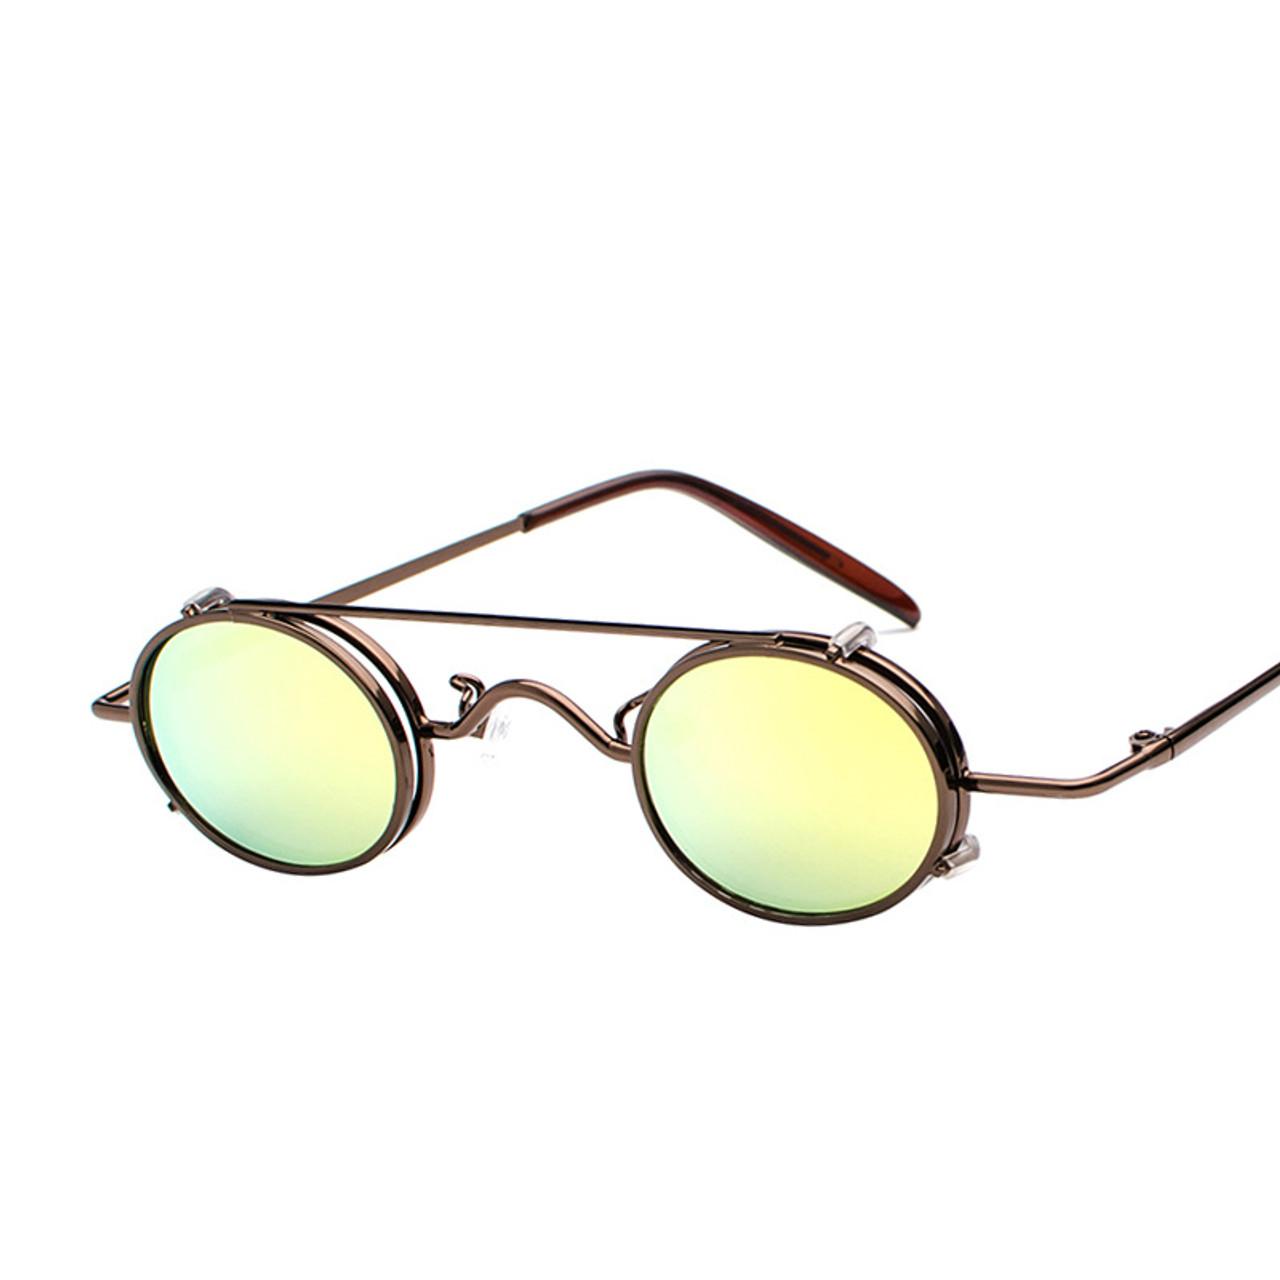 42ab880fb5b6 ... MOLNIYA 2018 Design Small Oval Sunglasses Steampunk Sun Glasses Women  Mirror Luxe 80s Round Sunglasses Mens ...